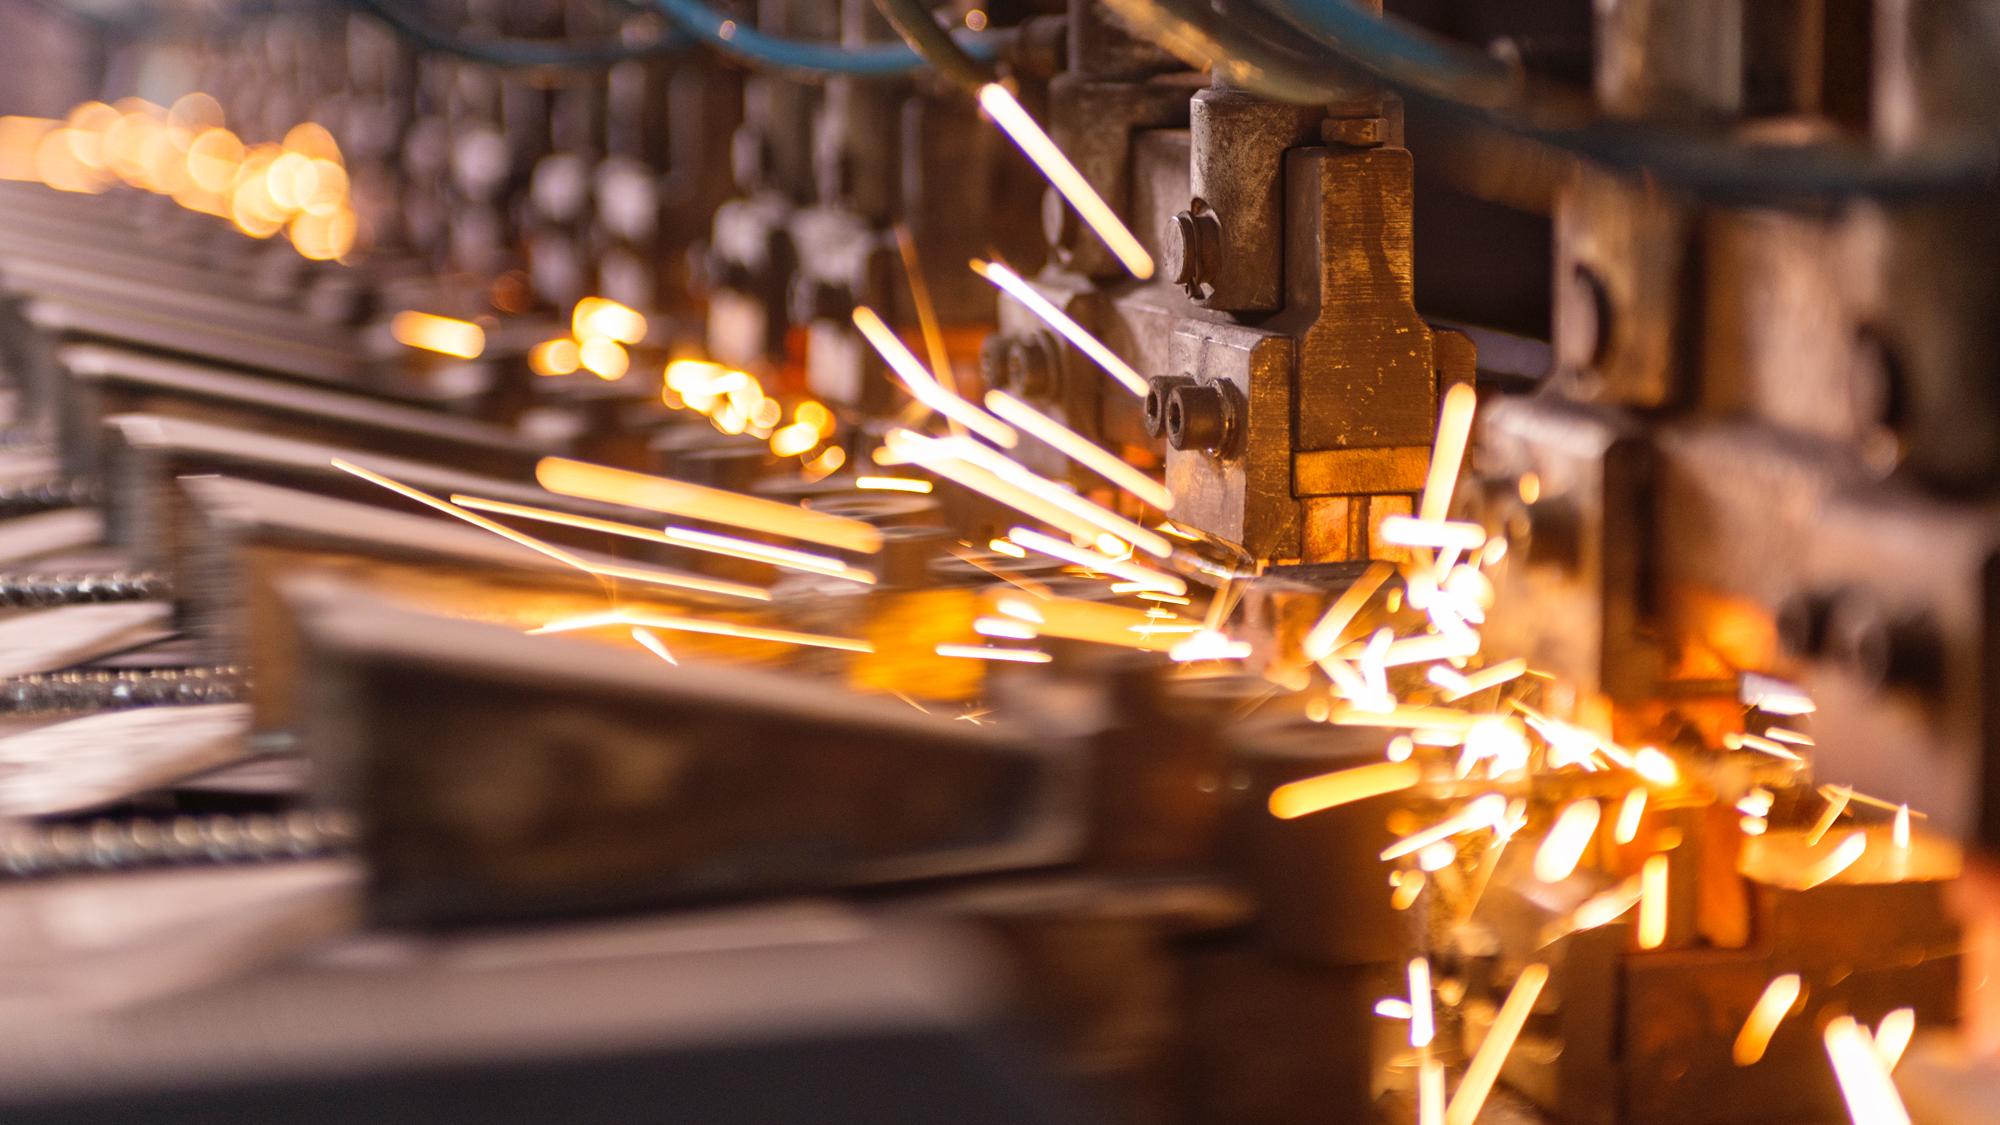 SUEZ manufacturing business image. Spot welding machine. Sparks